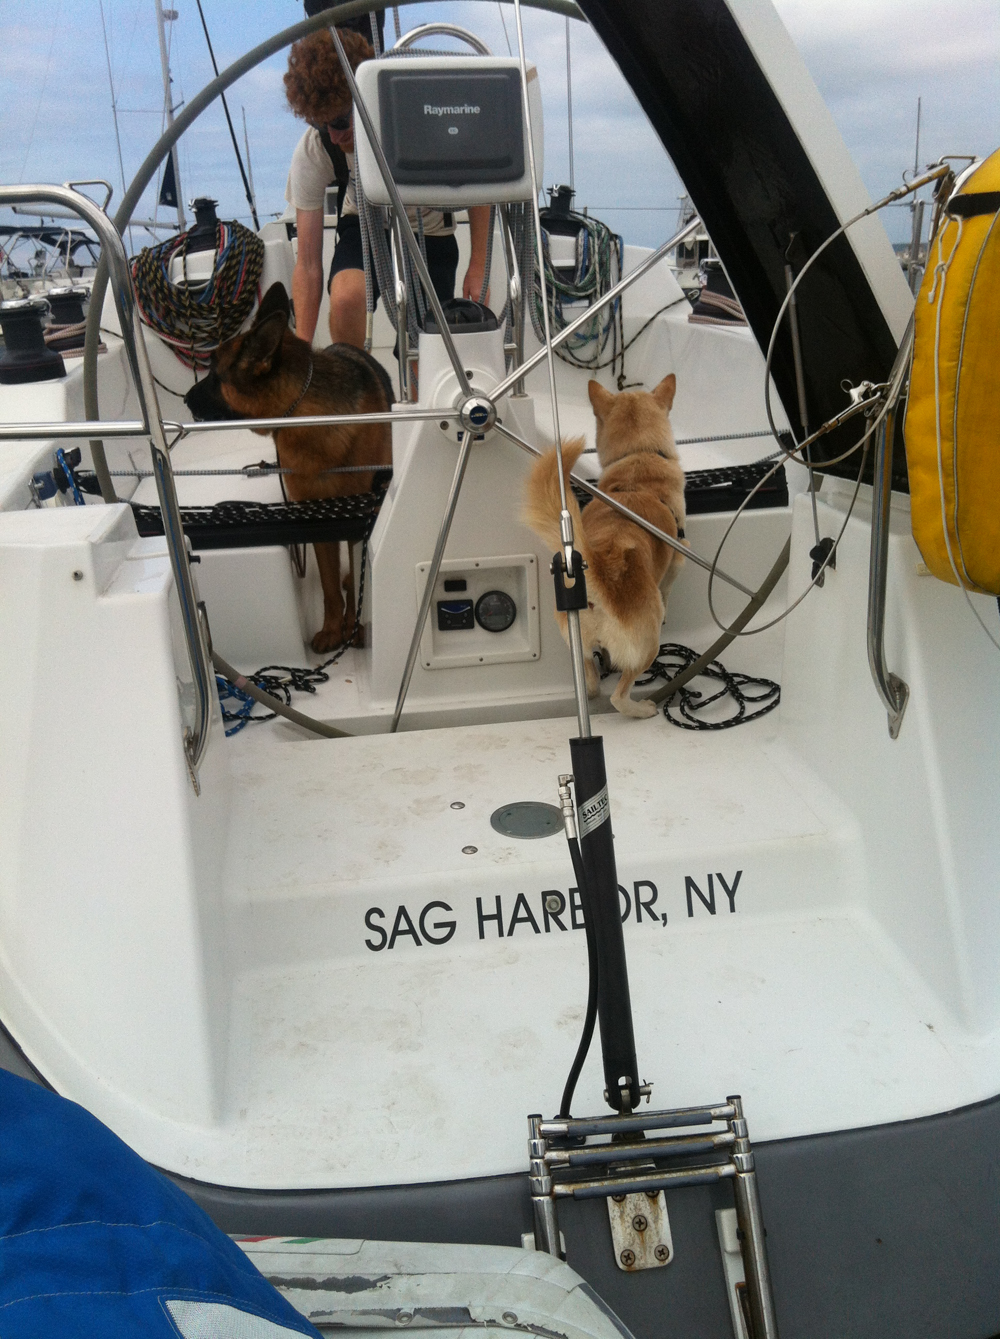 Sag Harbor.